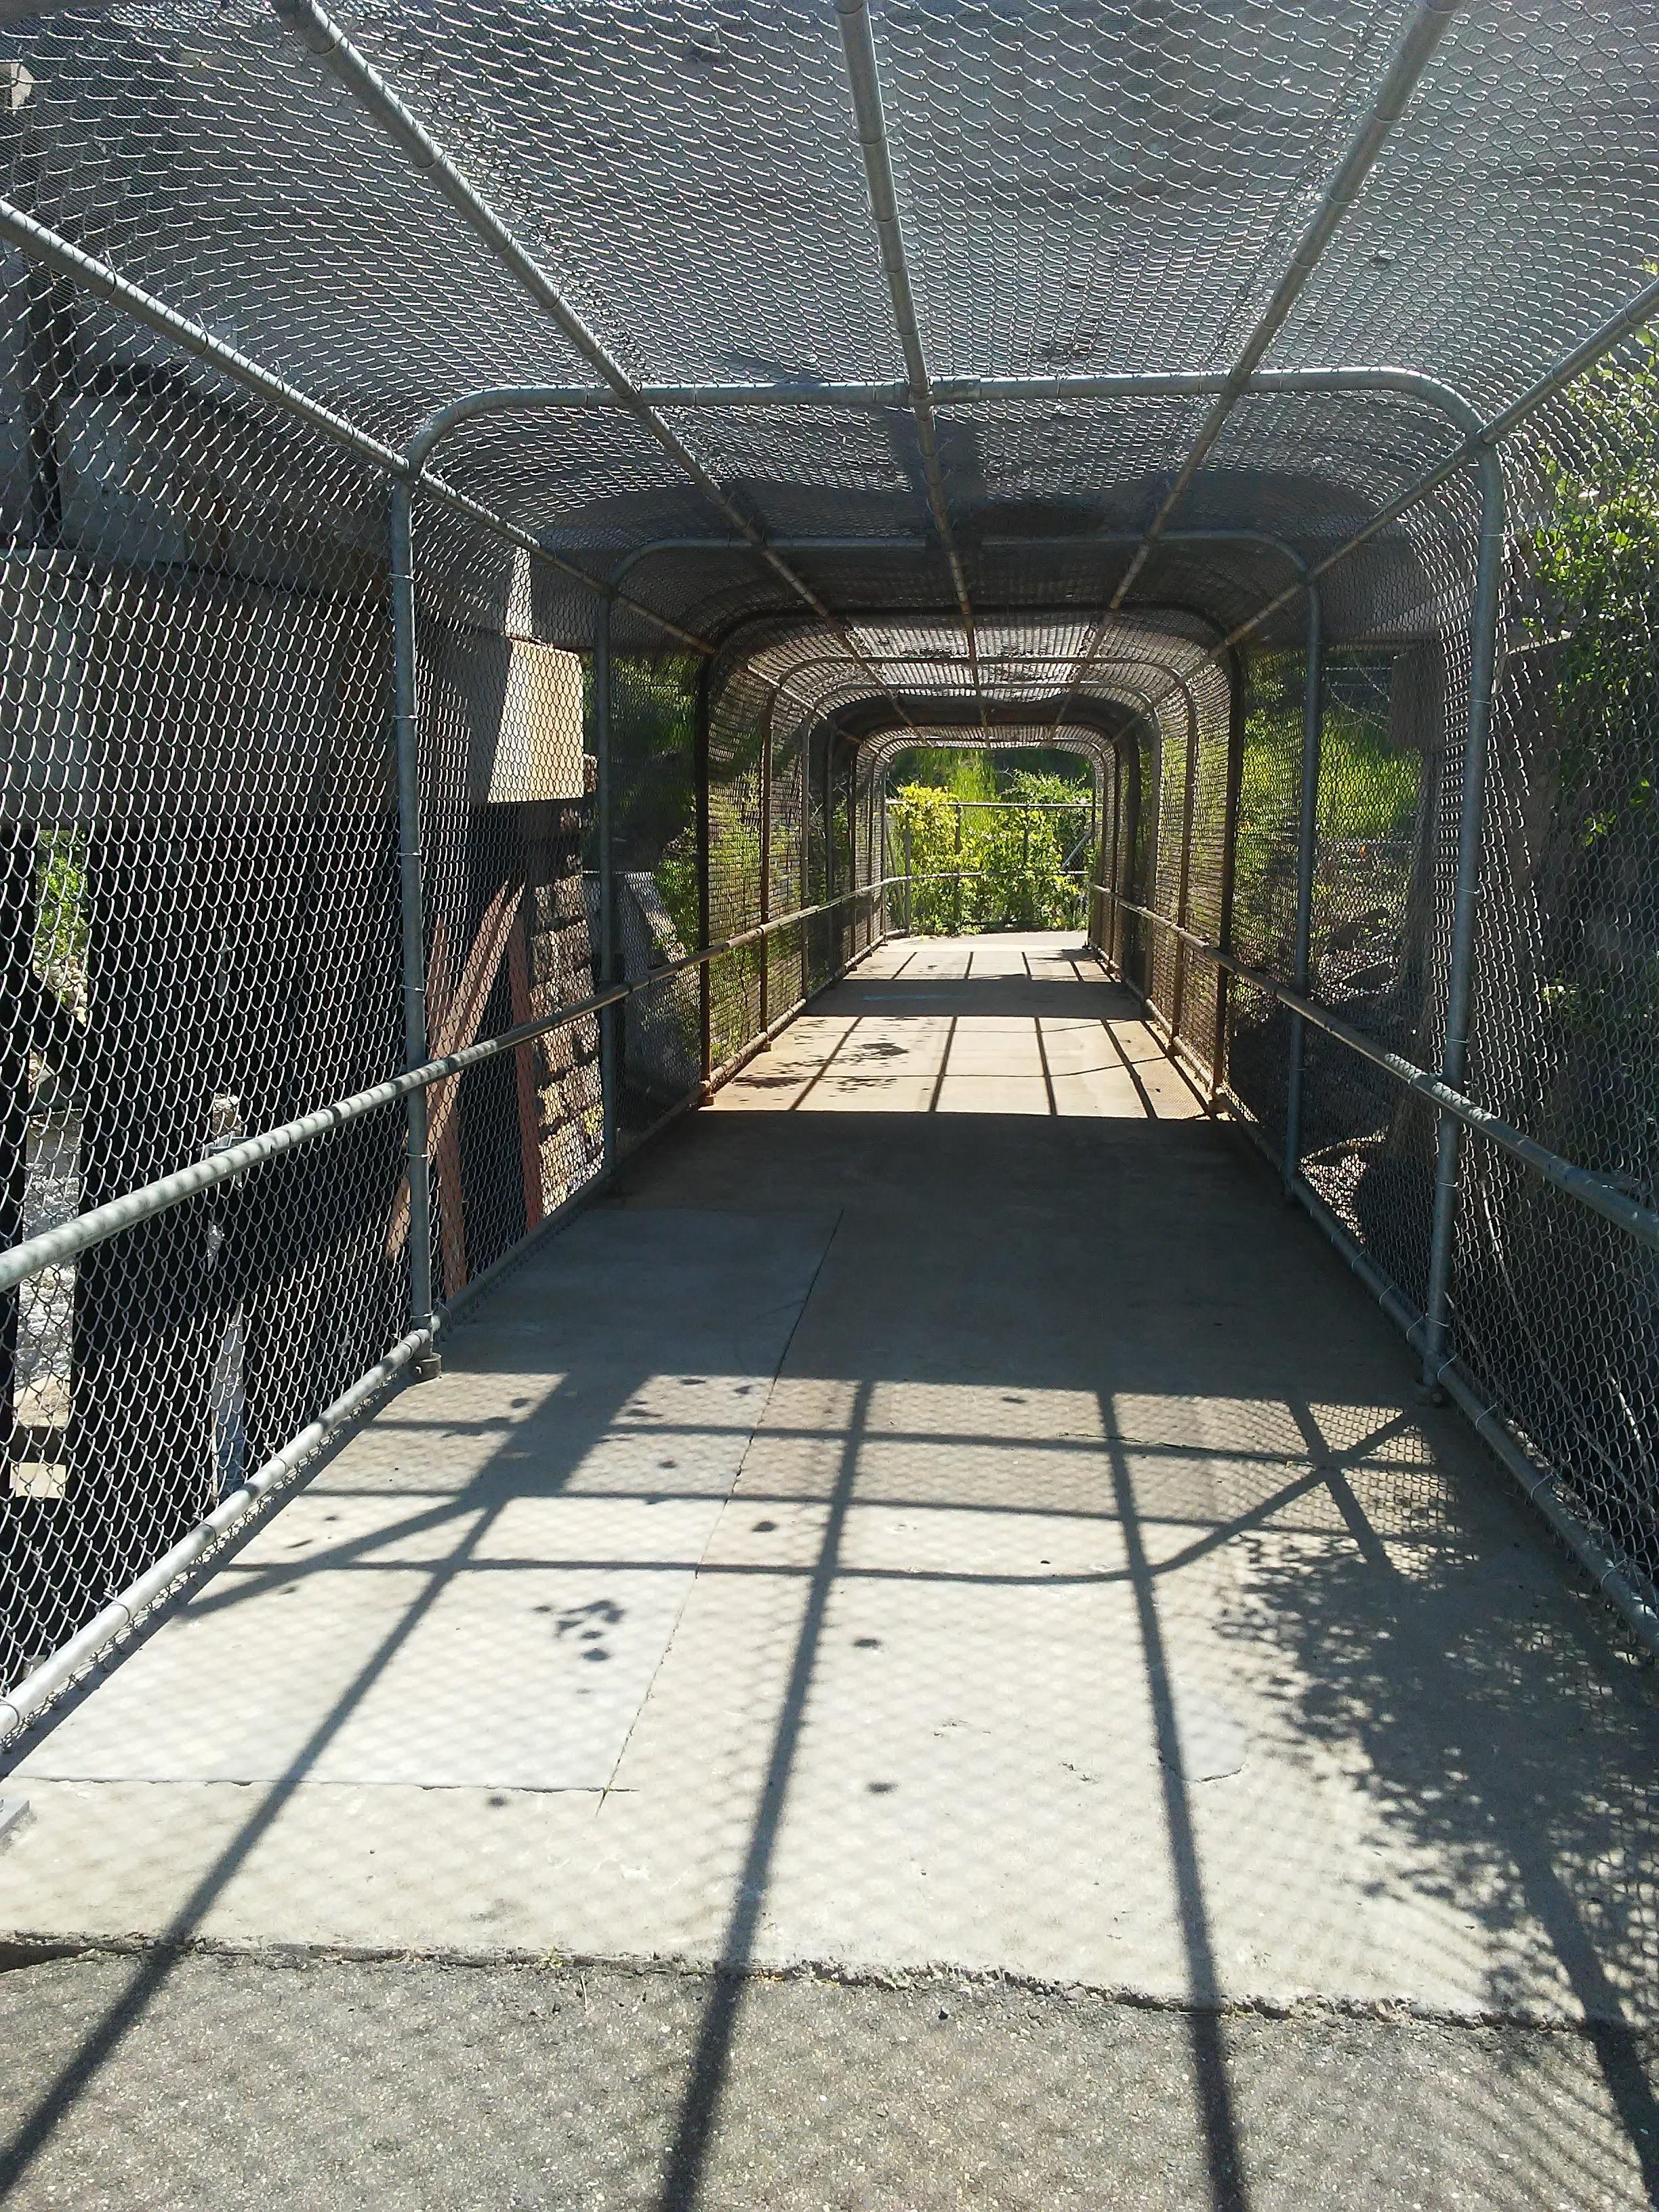 chain link fence tunnel around a bike path